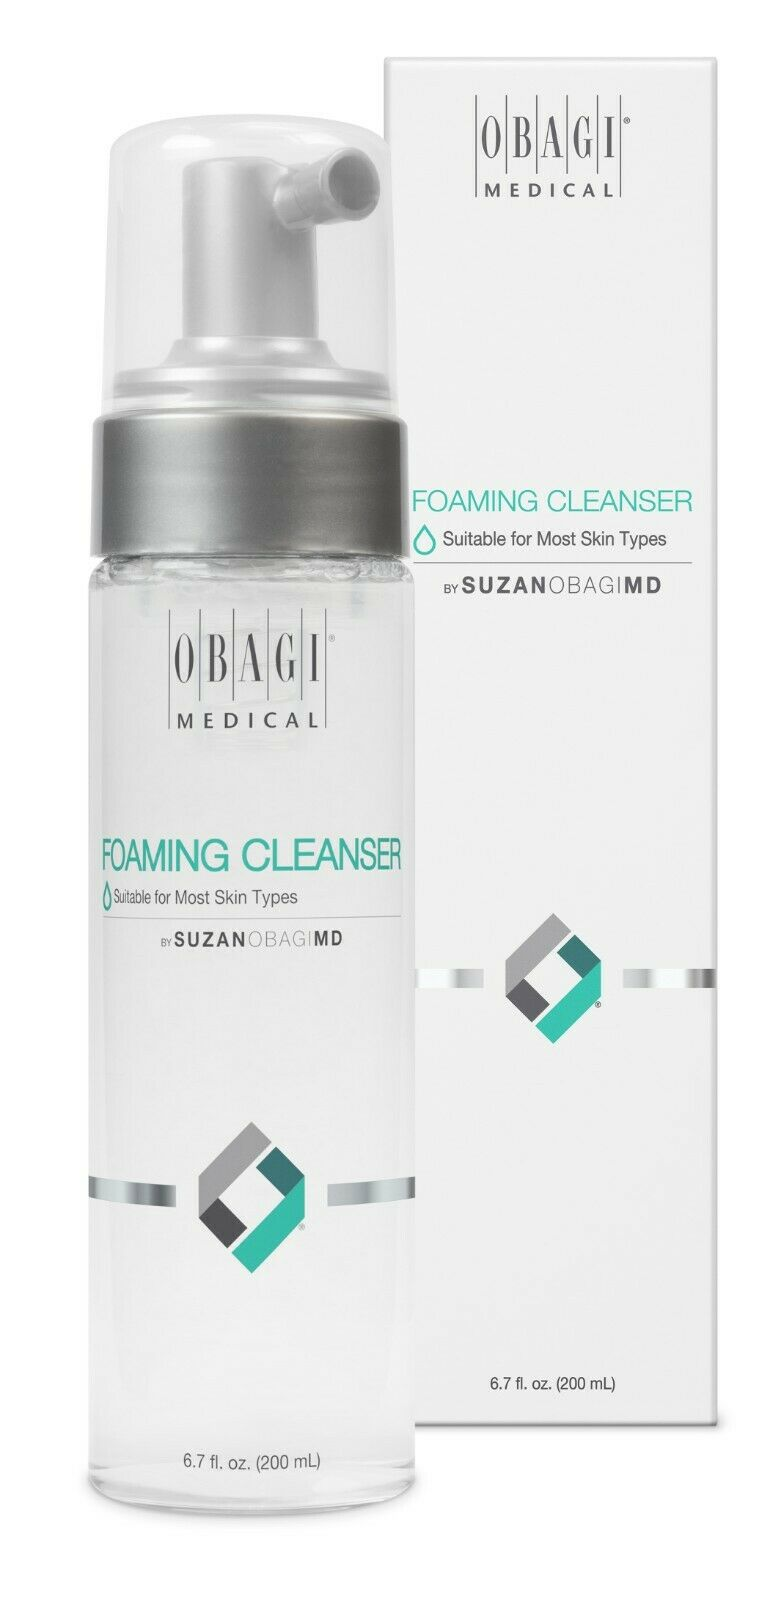 Obagi SuzanObagiMD Foaming Cleanser 6.7 fl oz